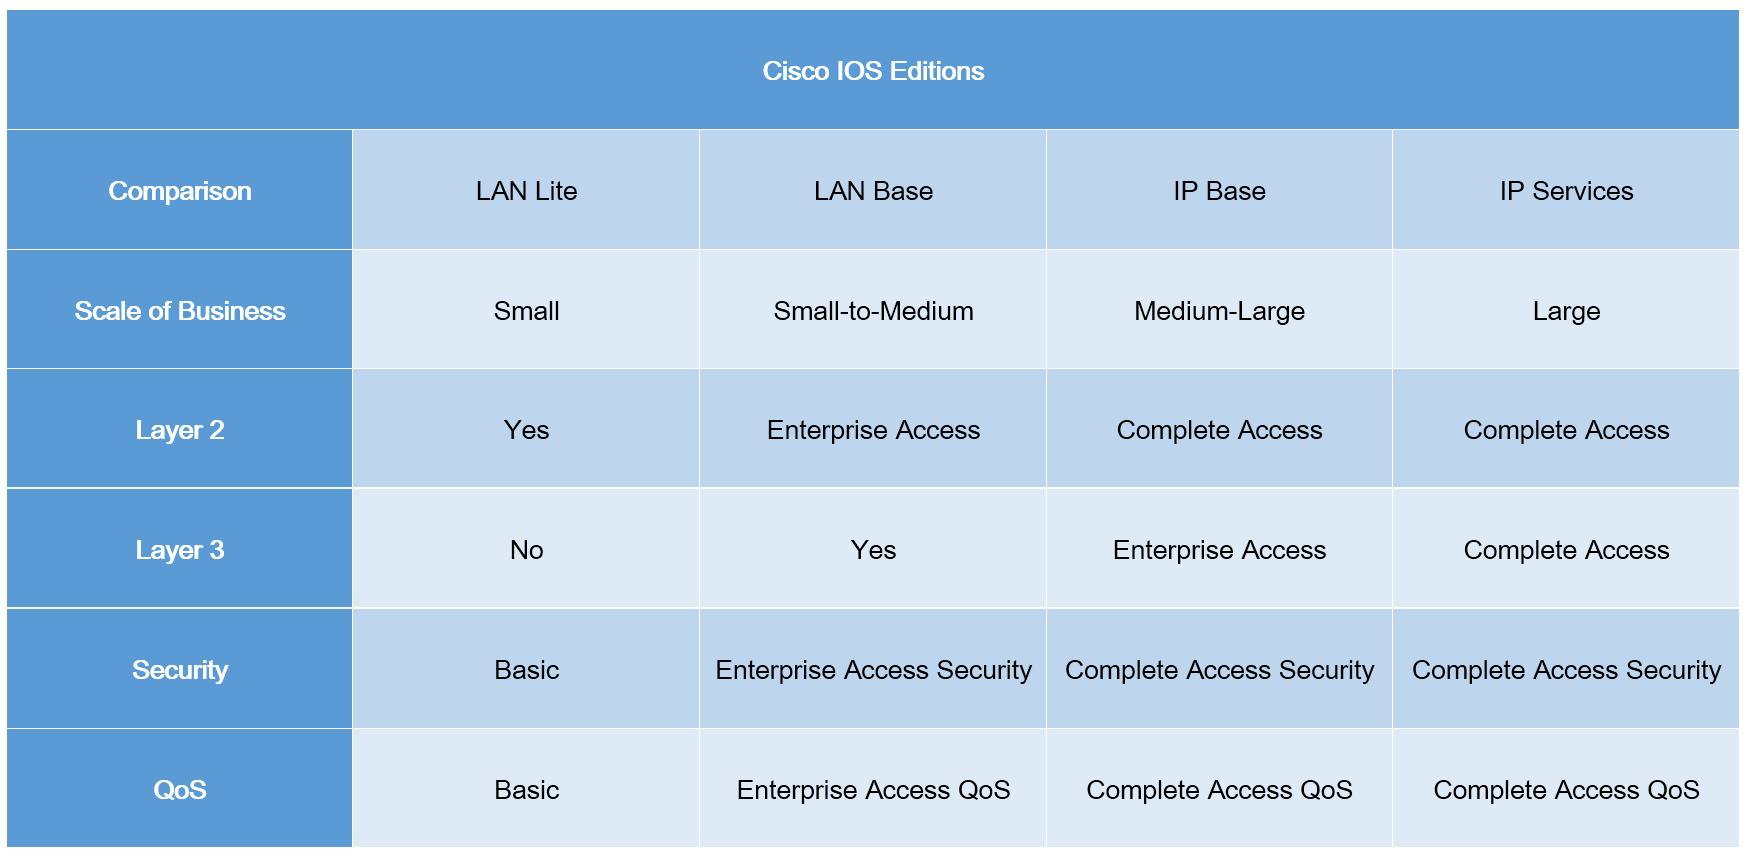 Cisco IOS comparison | Cisco Switch | Cisco switch, Ios